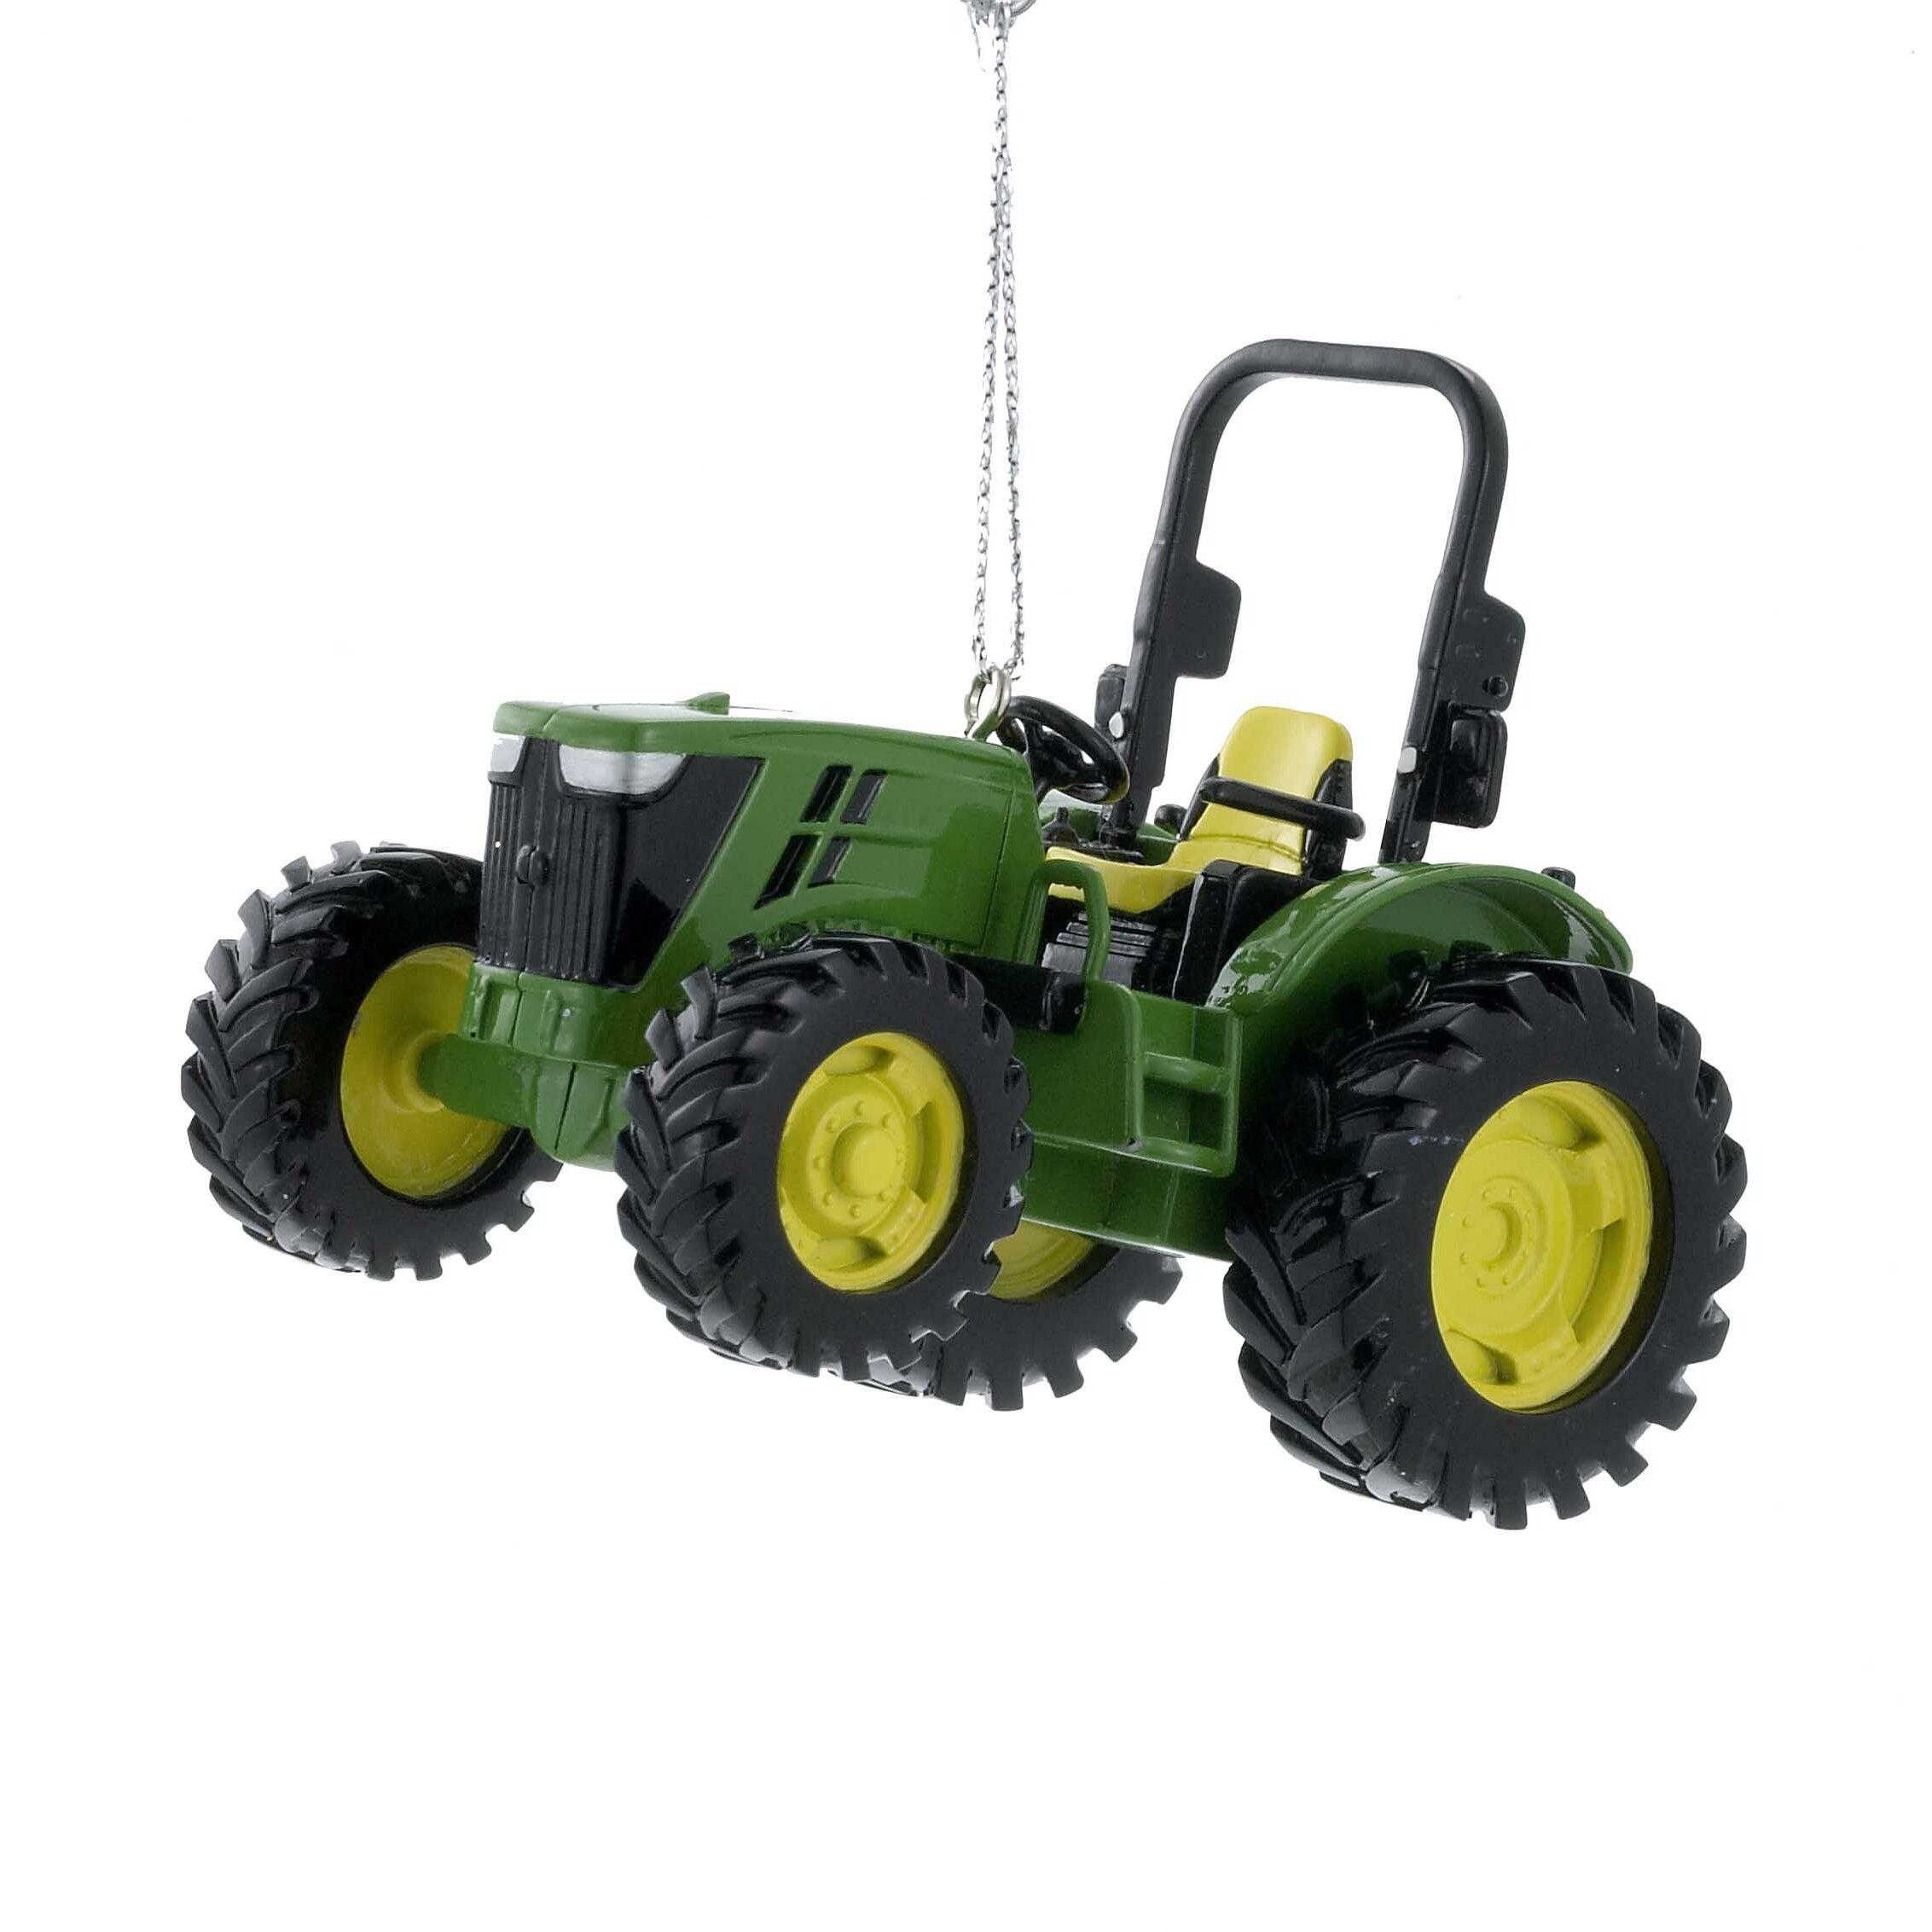 John Deere Tractor Wood Ornaments : Kurt adler john deere utility tractor ornament reviews